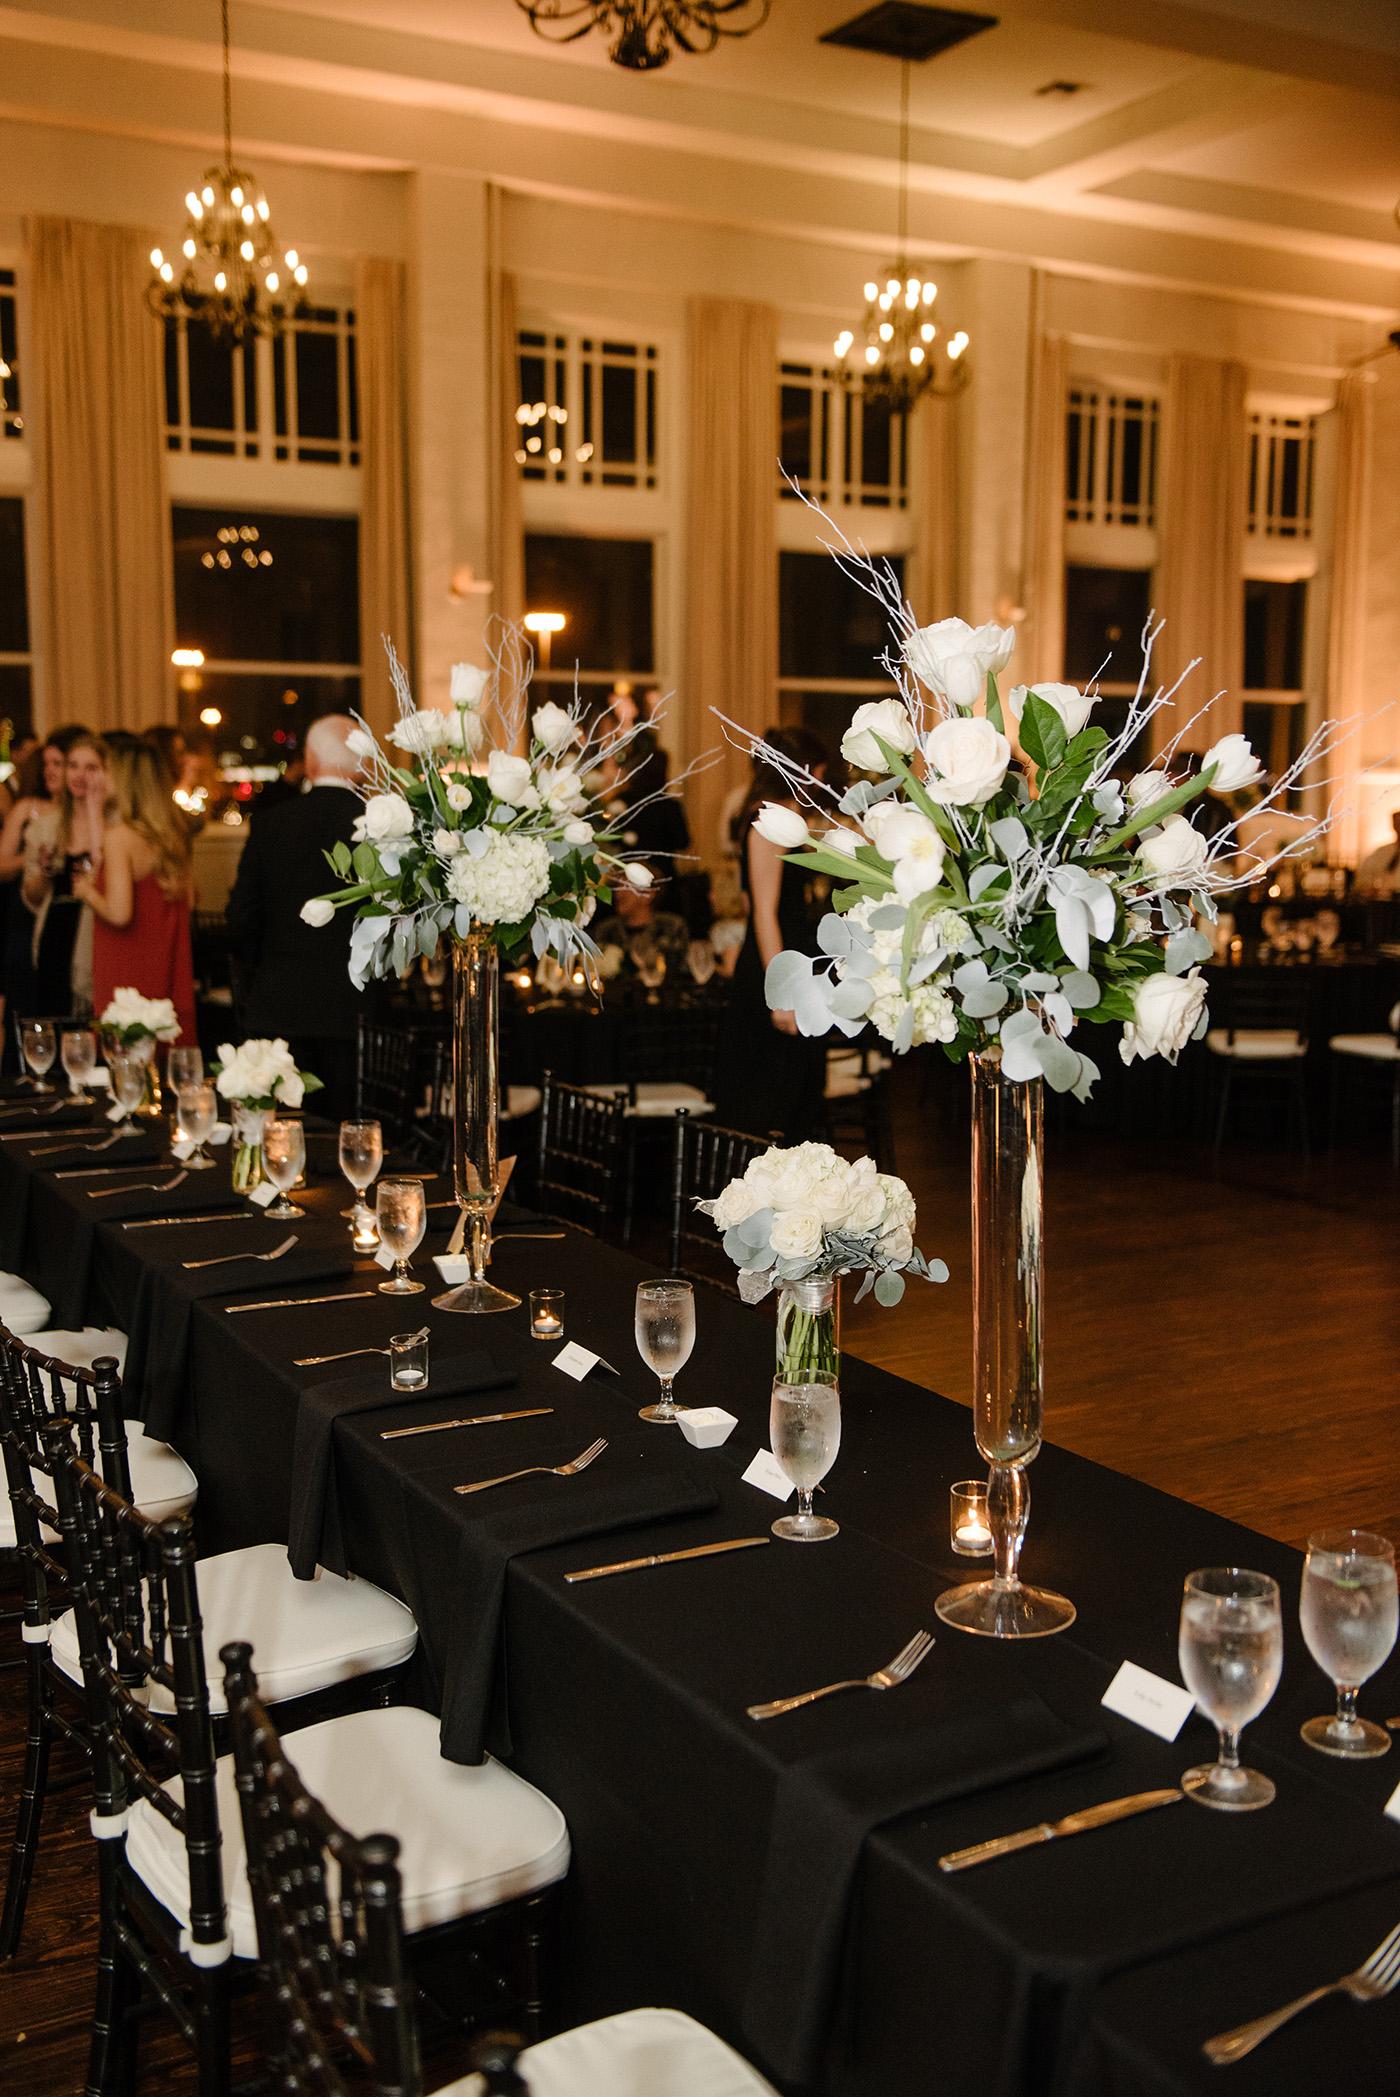 Dallas Wedding Planner - Winter Wedding at The Room on Main - Allday Events - 33.jpg